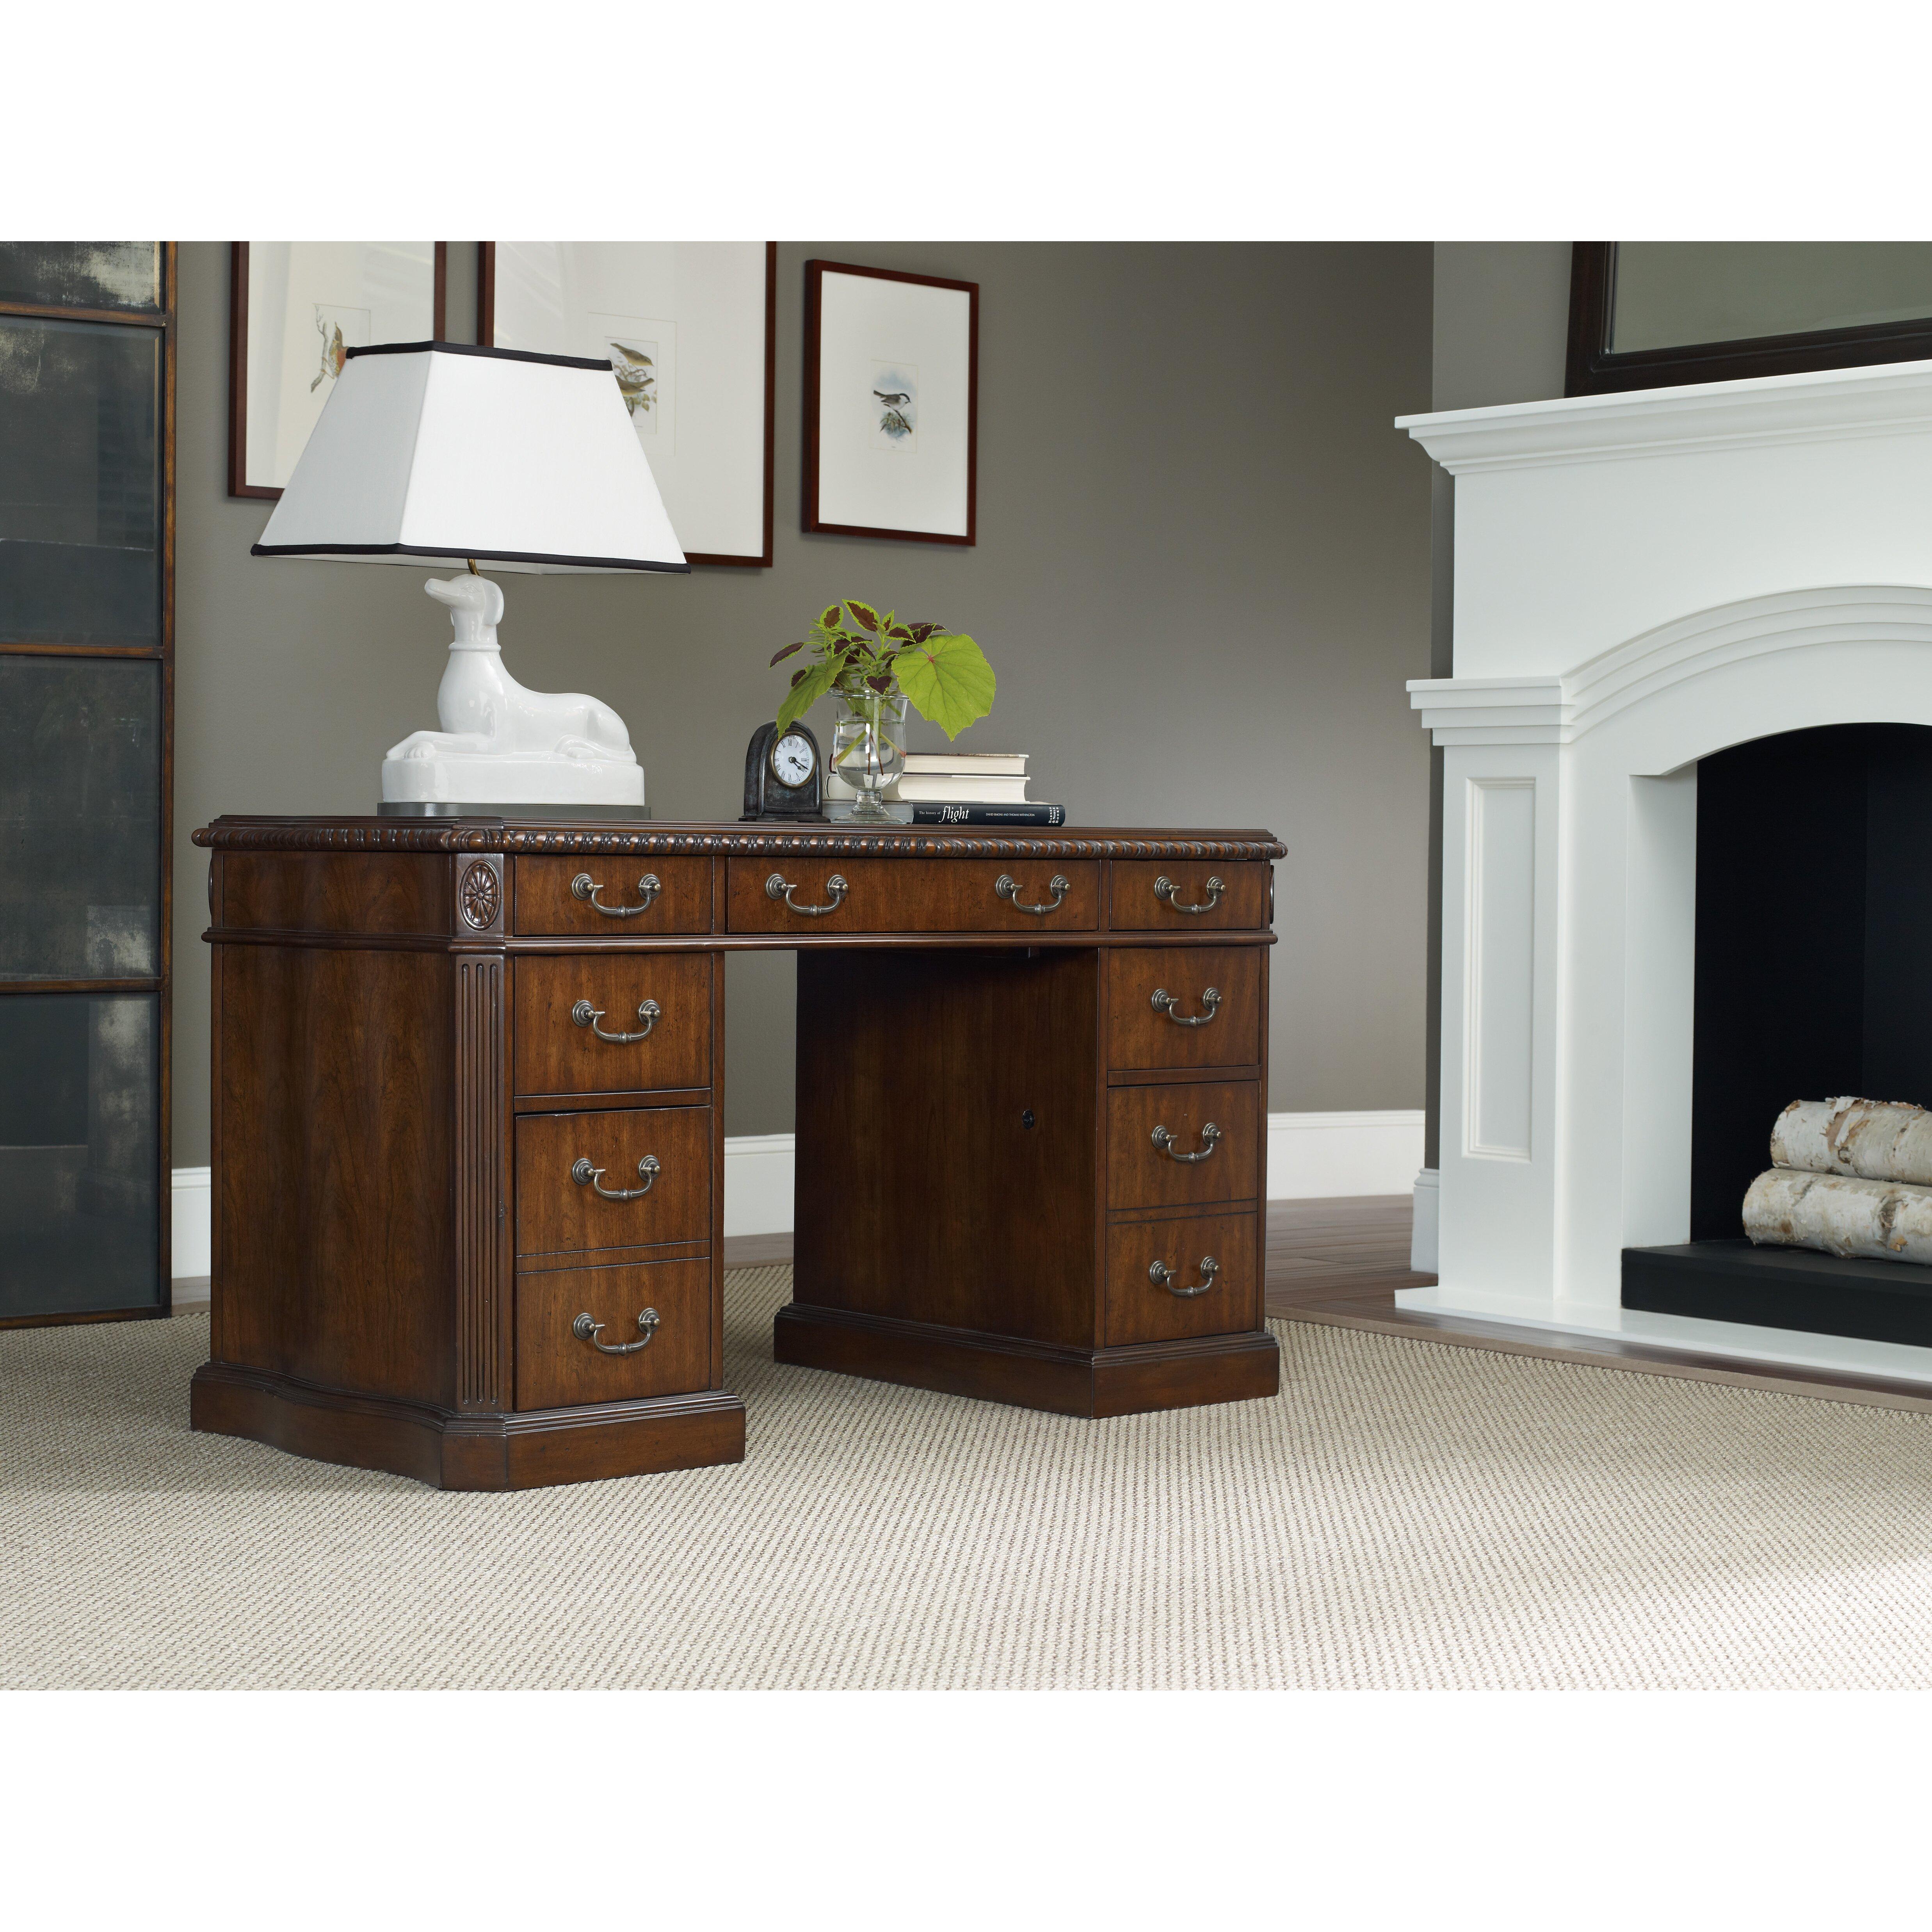 Hooker Furniture Executive Desk With Knee Hole Reviews Wayfair